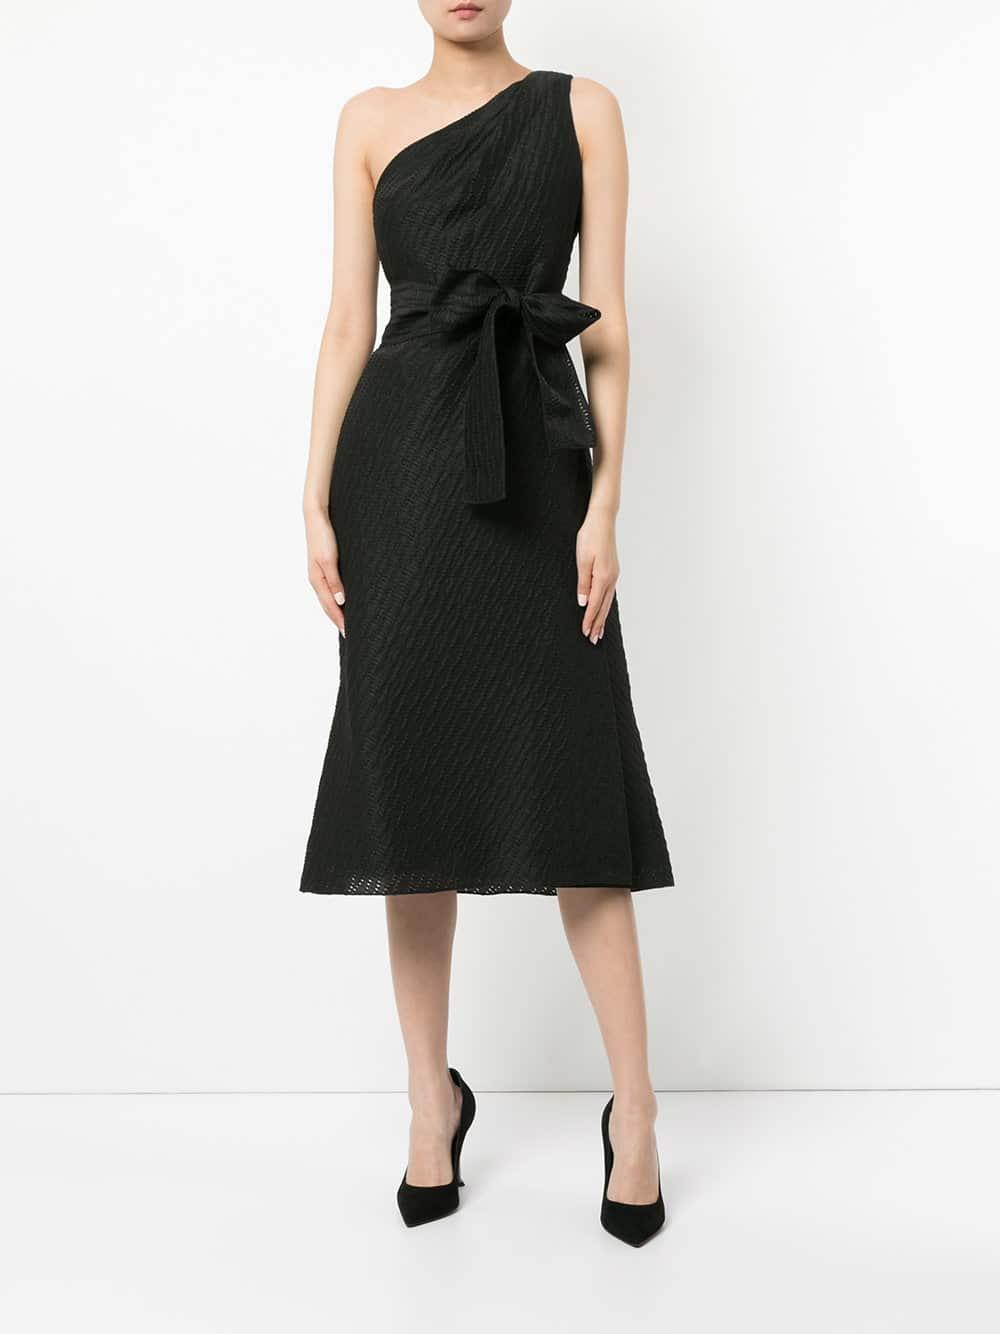 CAROLINA HERRERA Asymmetric Tweed Column Black Dress - We Select Dresses